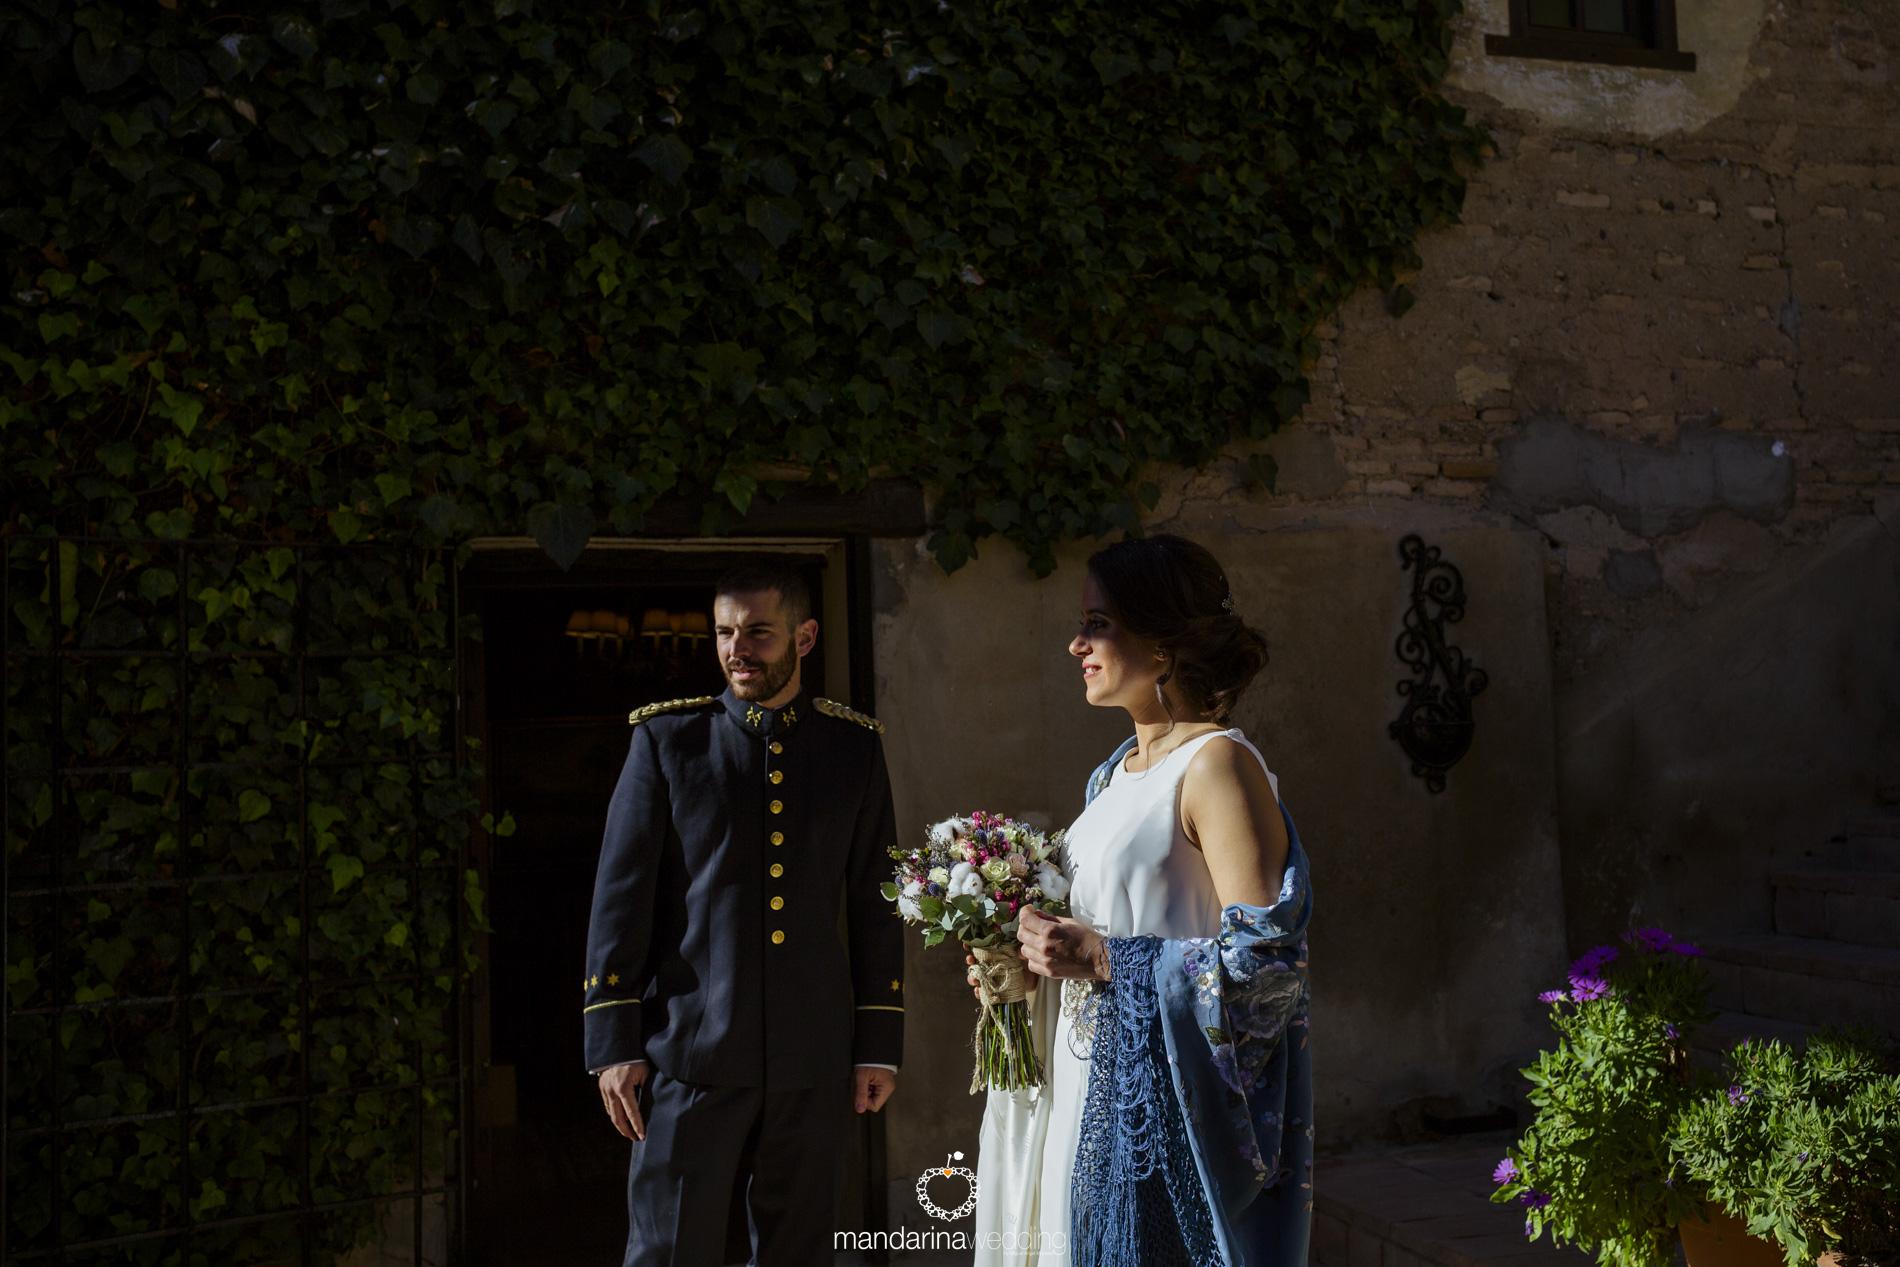 mandarina wedding, fotografos de boda, fotografo boda soria, fotografo boda barcelona, fotografo boda Madrid, fotógrafo boda lerida_32